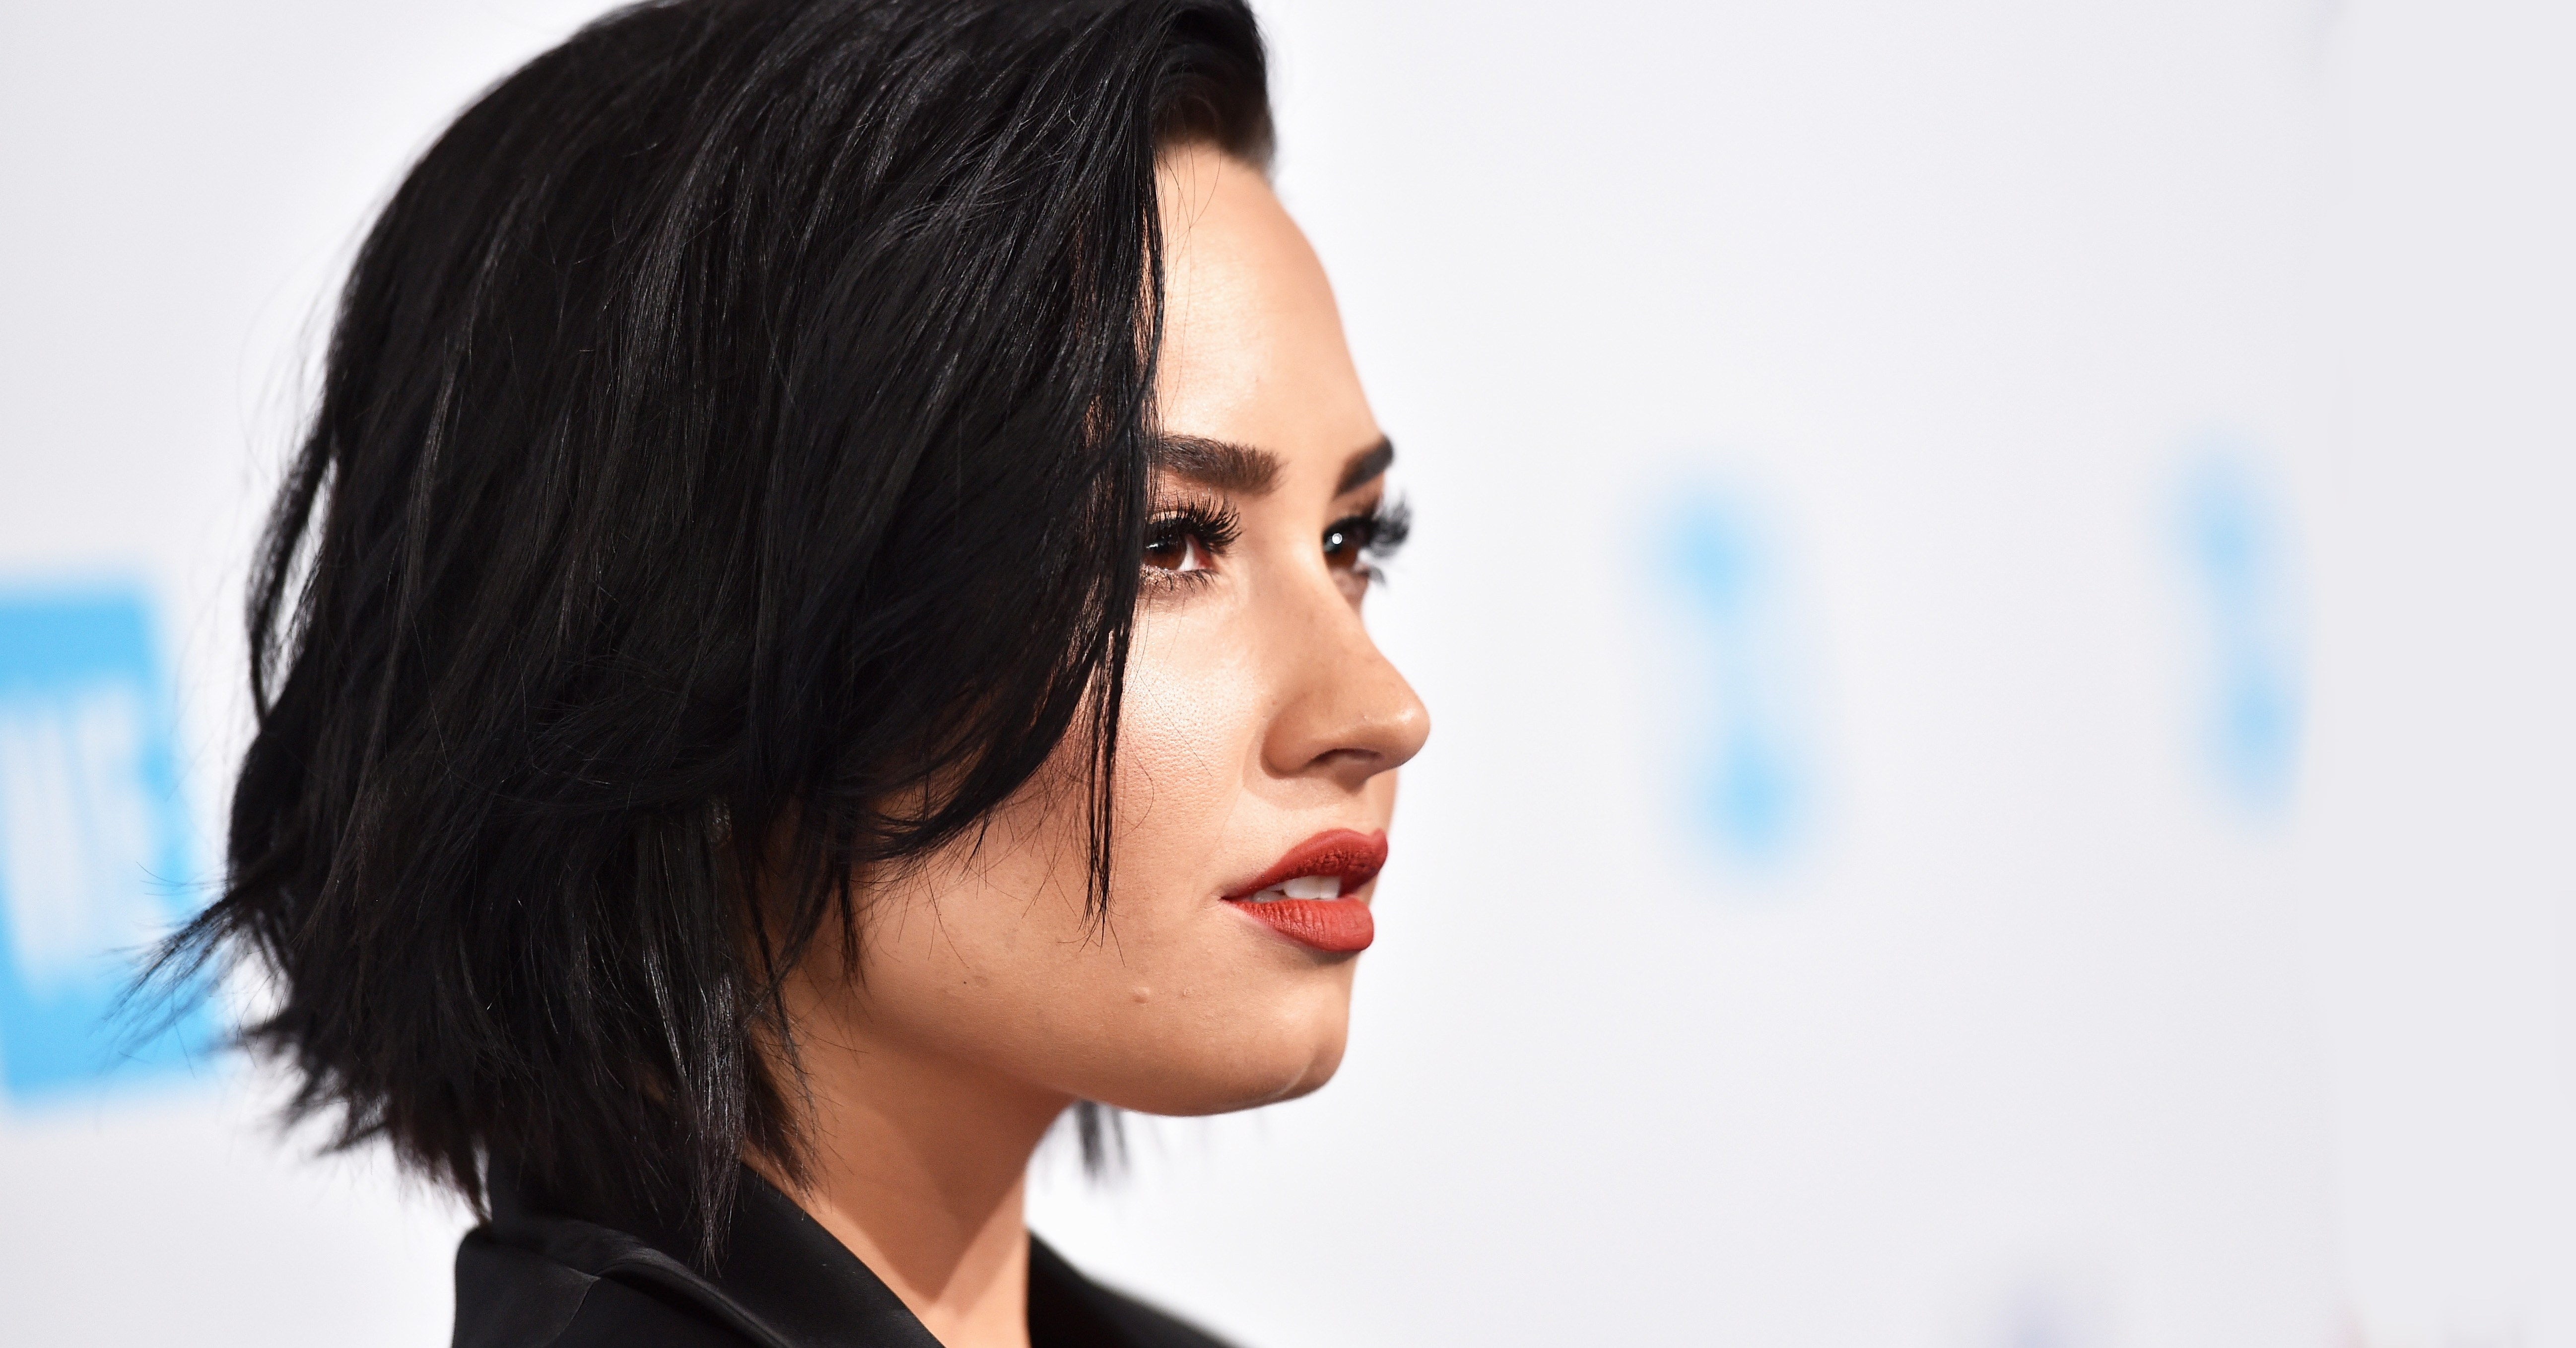 Demi Lovato Bob Frisuren für 2018